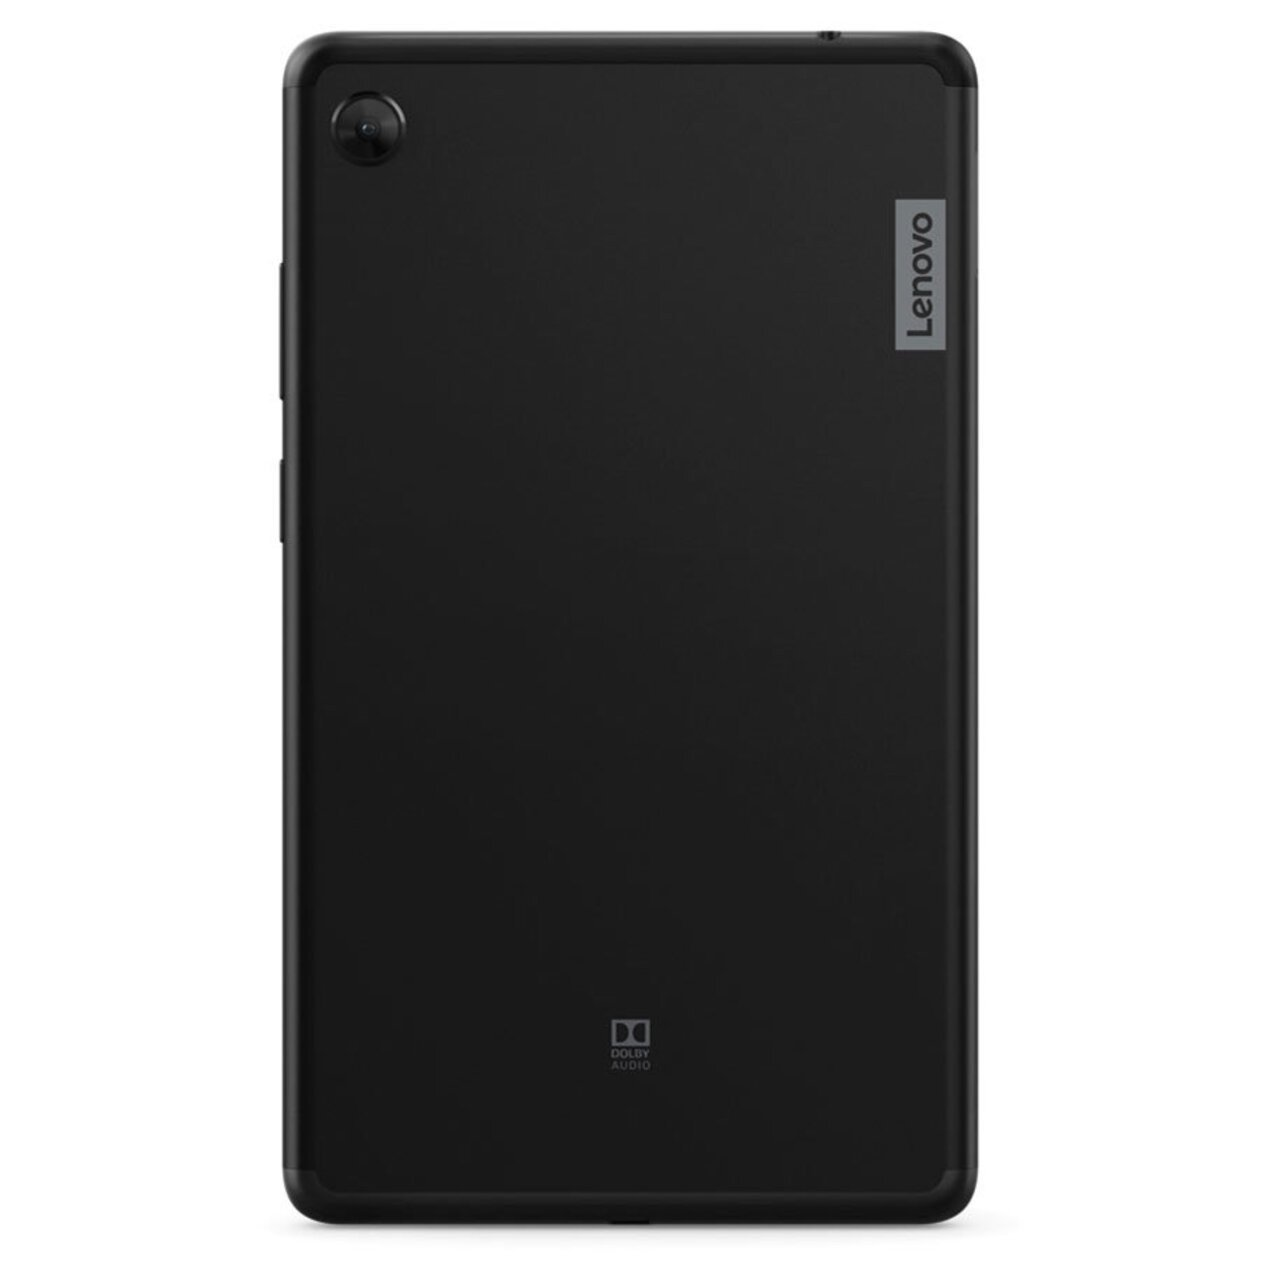 Таблет Lenovo TAB TB-7305F 16/1 WIFI ZA550024BG , 1 GB, 16 GB